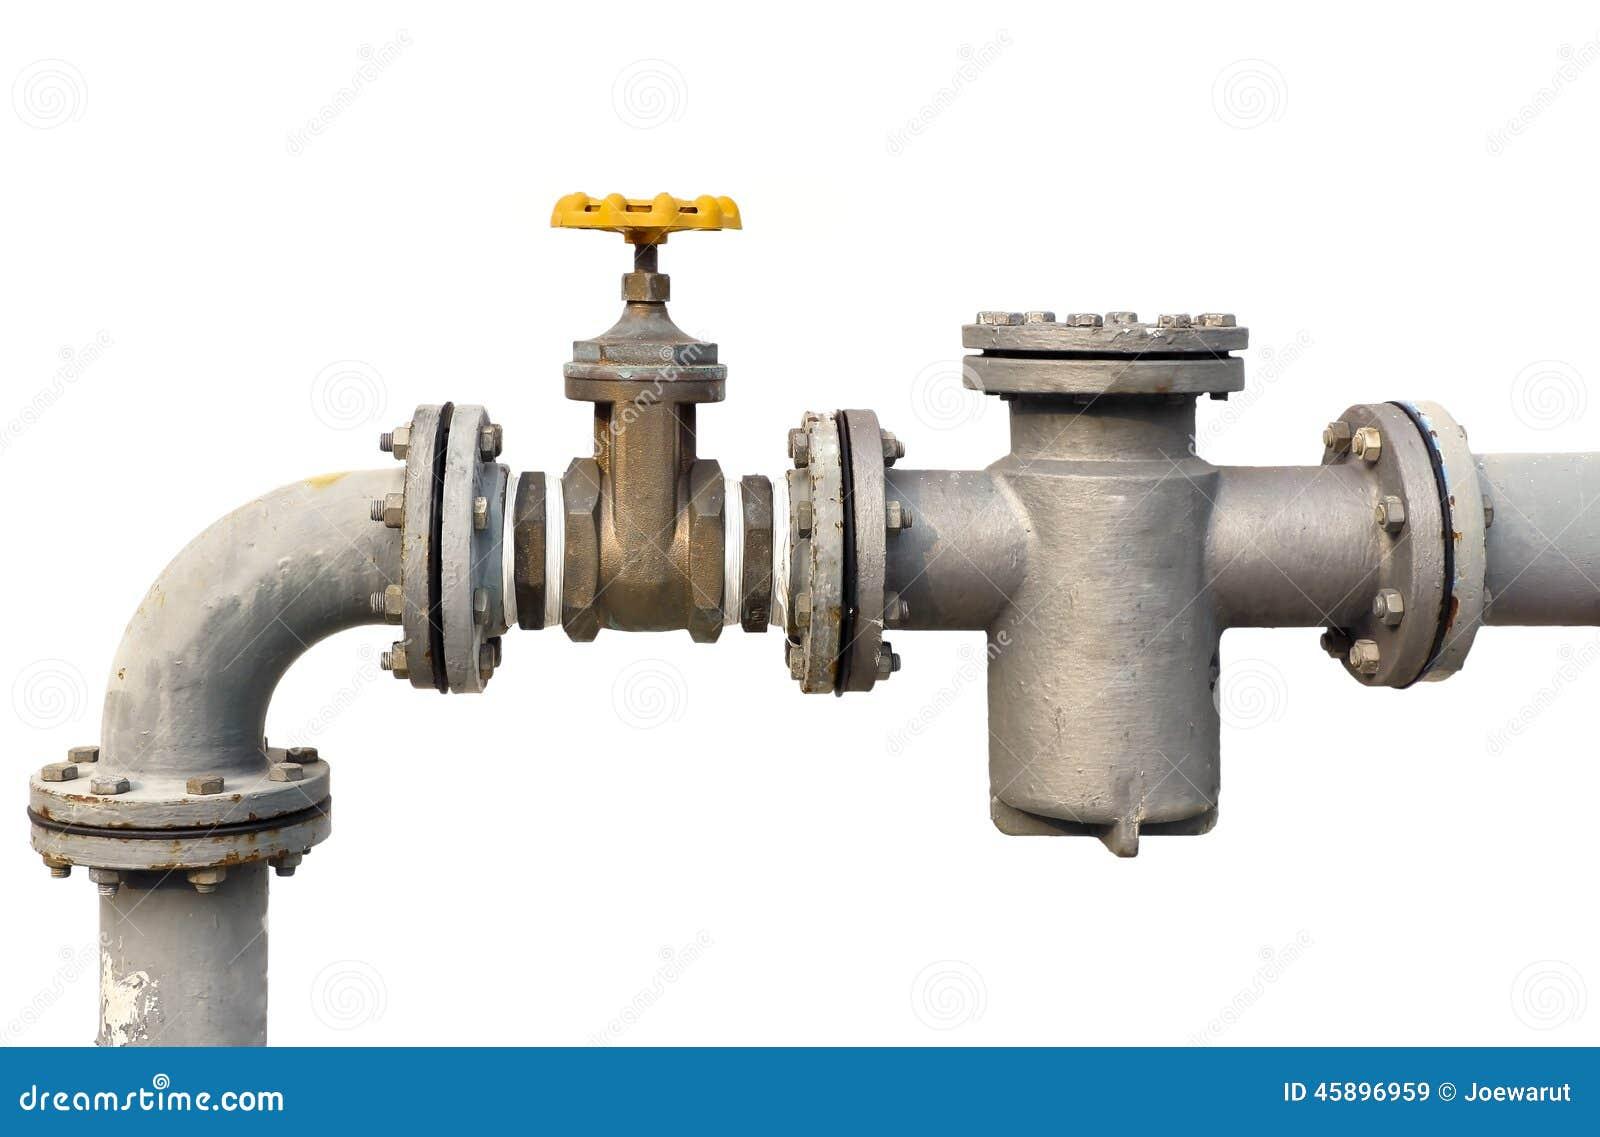 water pipe valve stock photo image 45896959. Black Bedroom Furniture Sets. Home Design Ideas